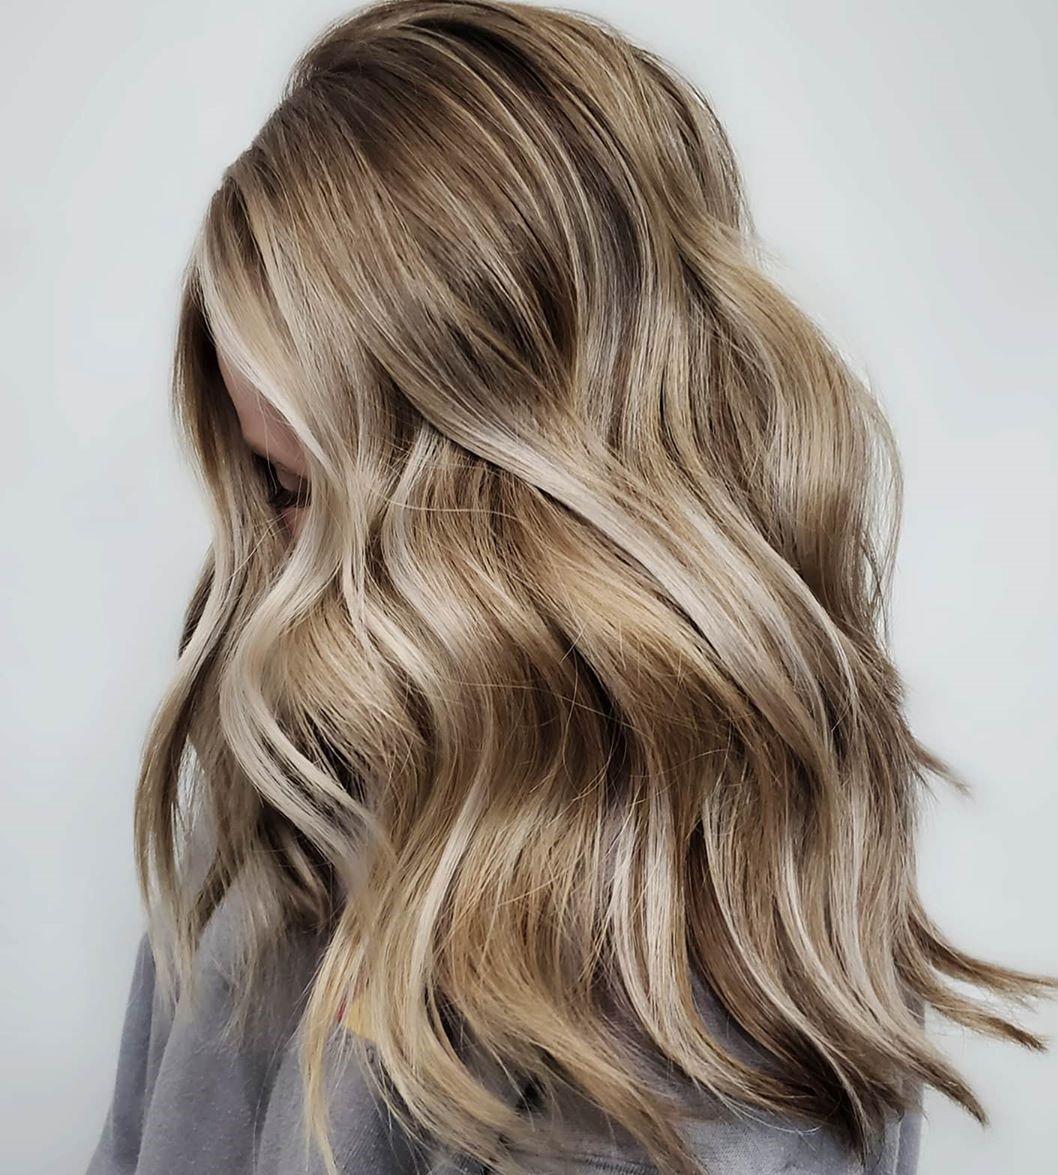 40 Effortlessly Hot Dirty Blonde Hair Ideas For 2021 Hair Adviser